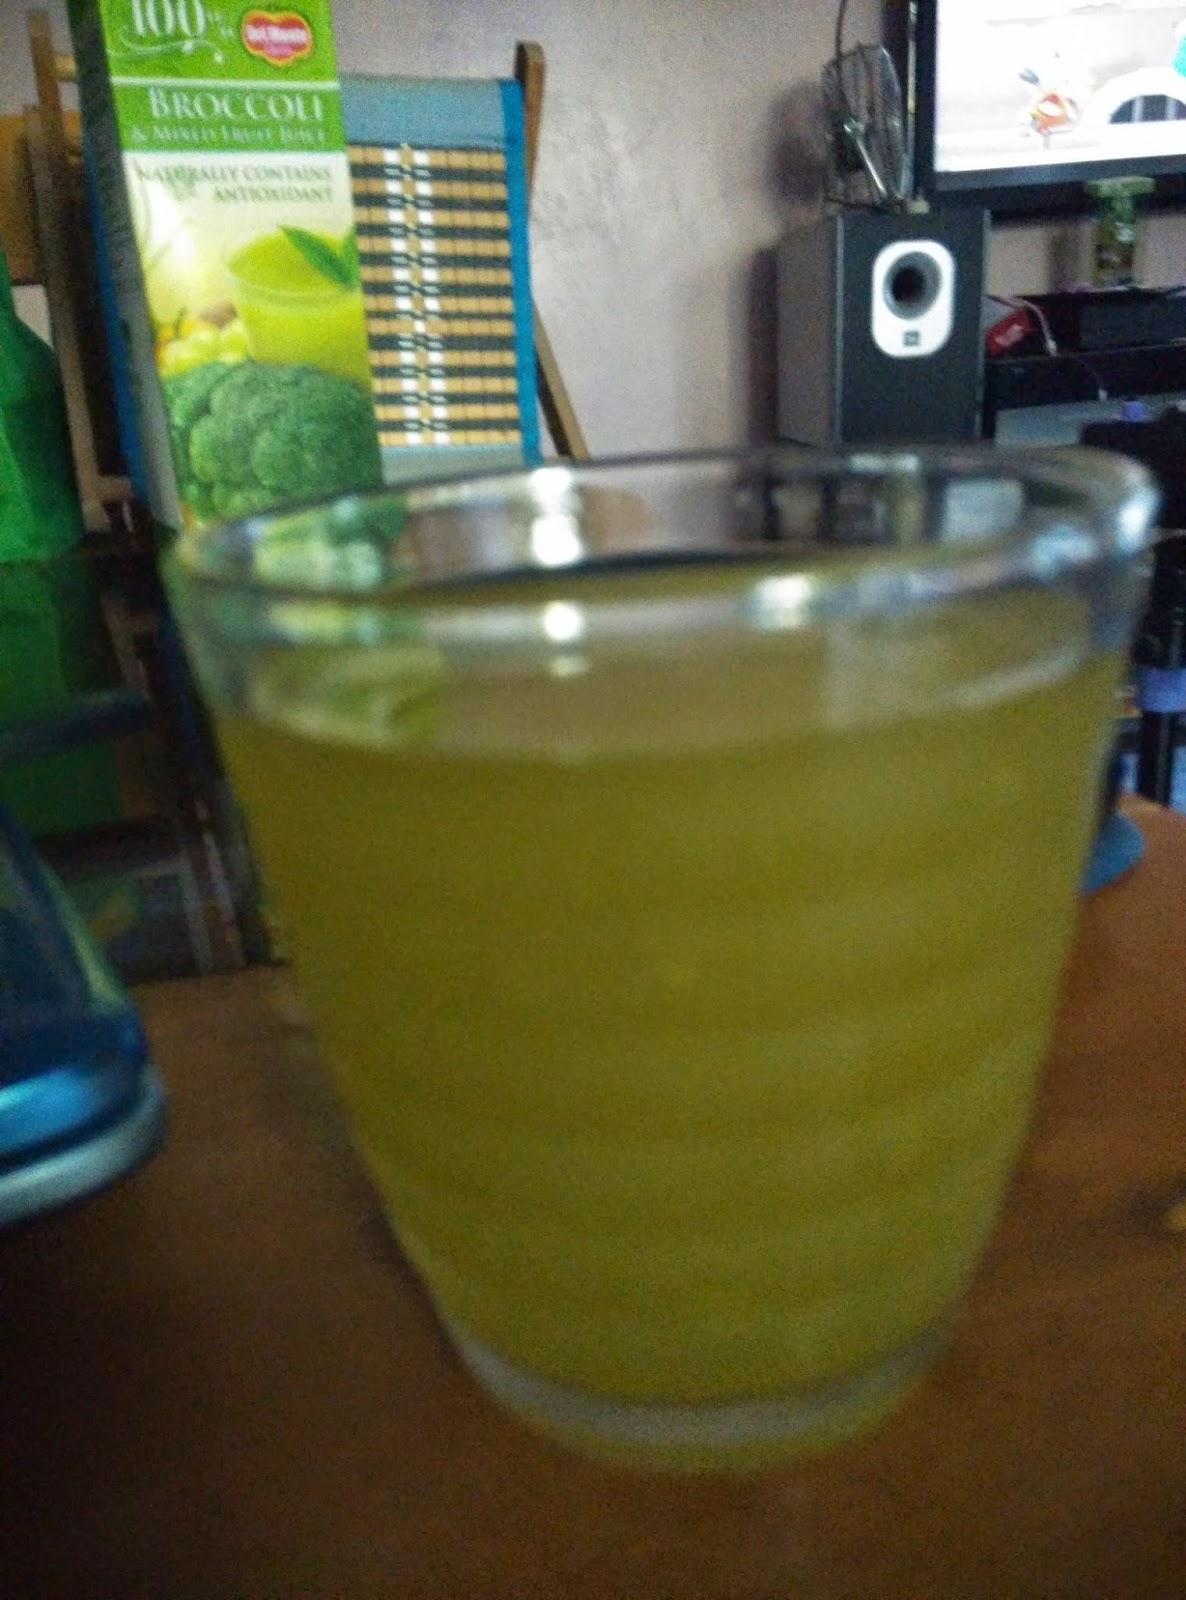 tipco juice review